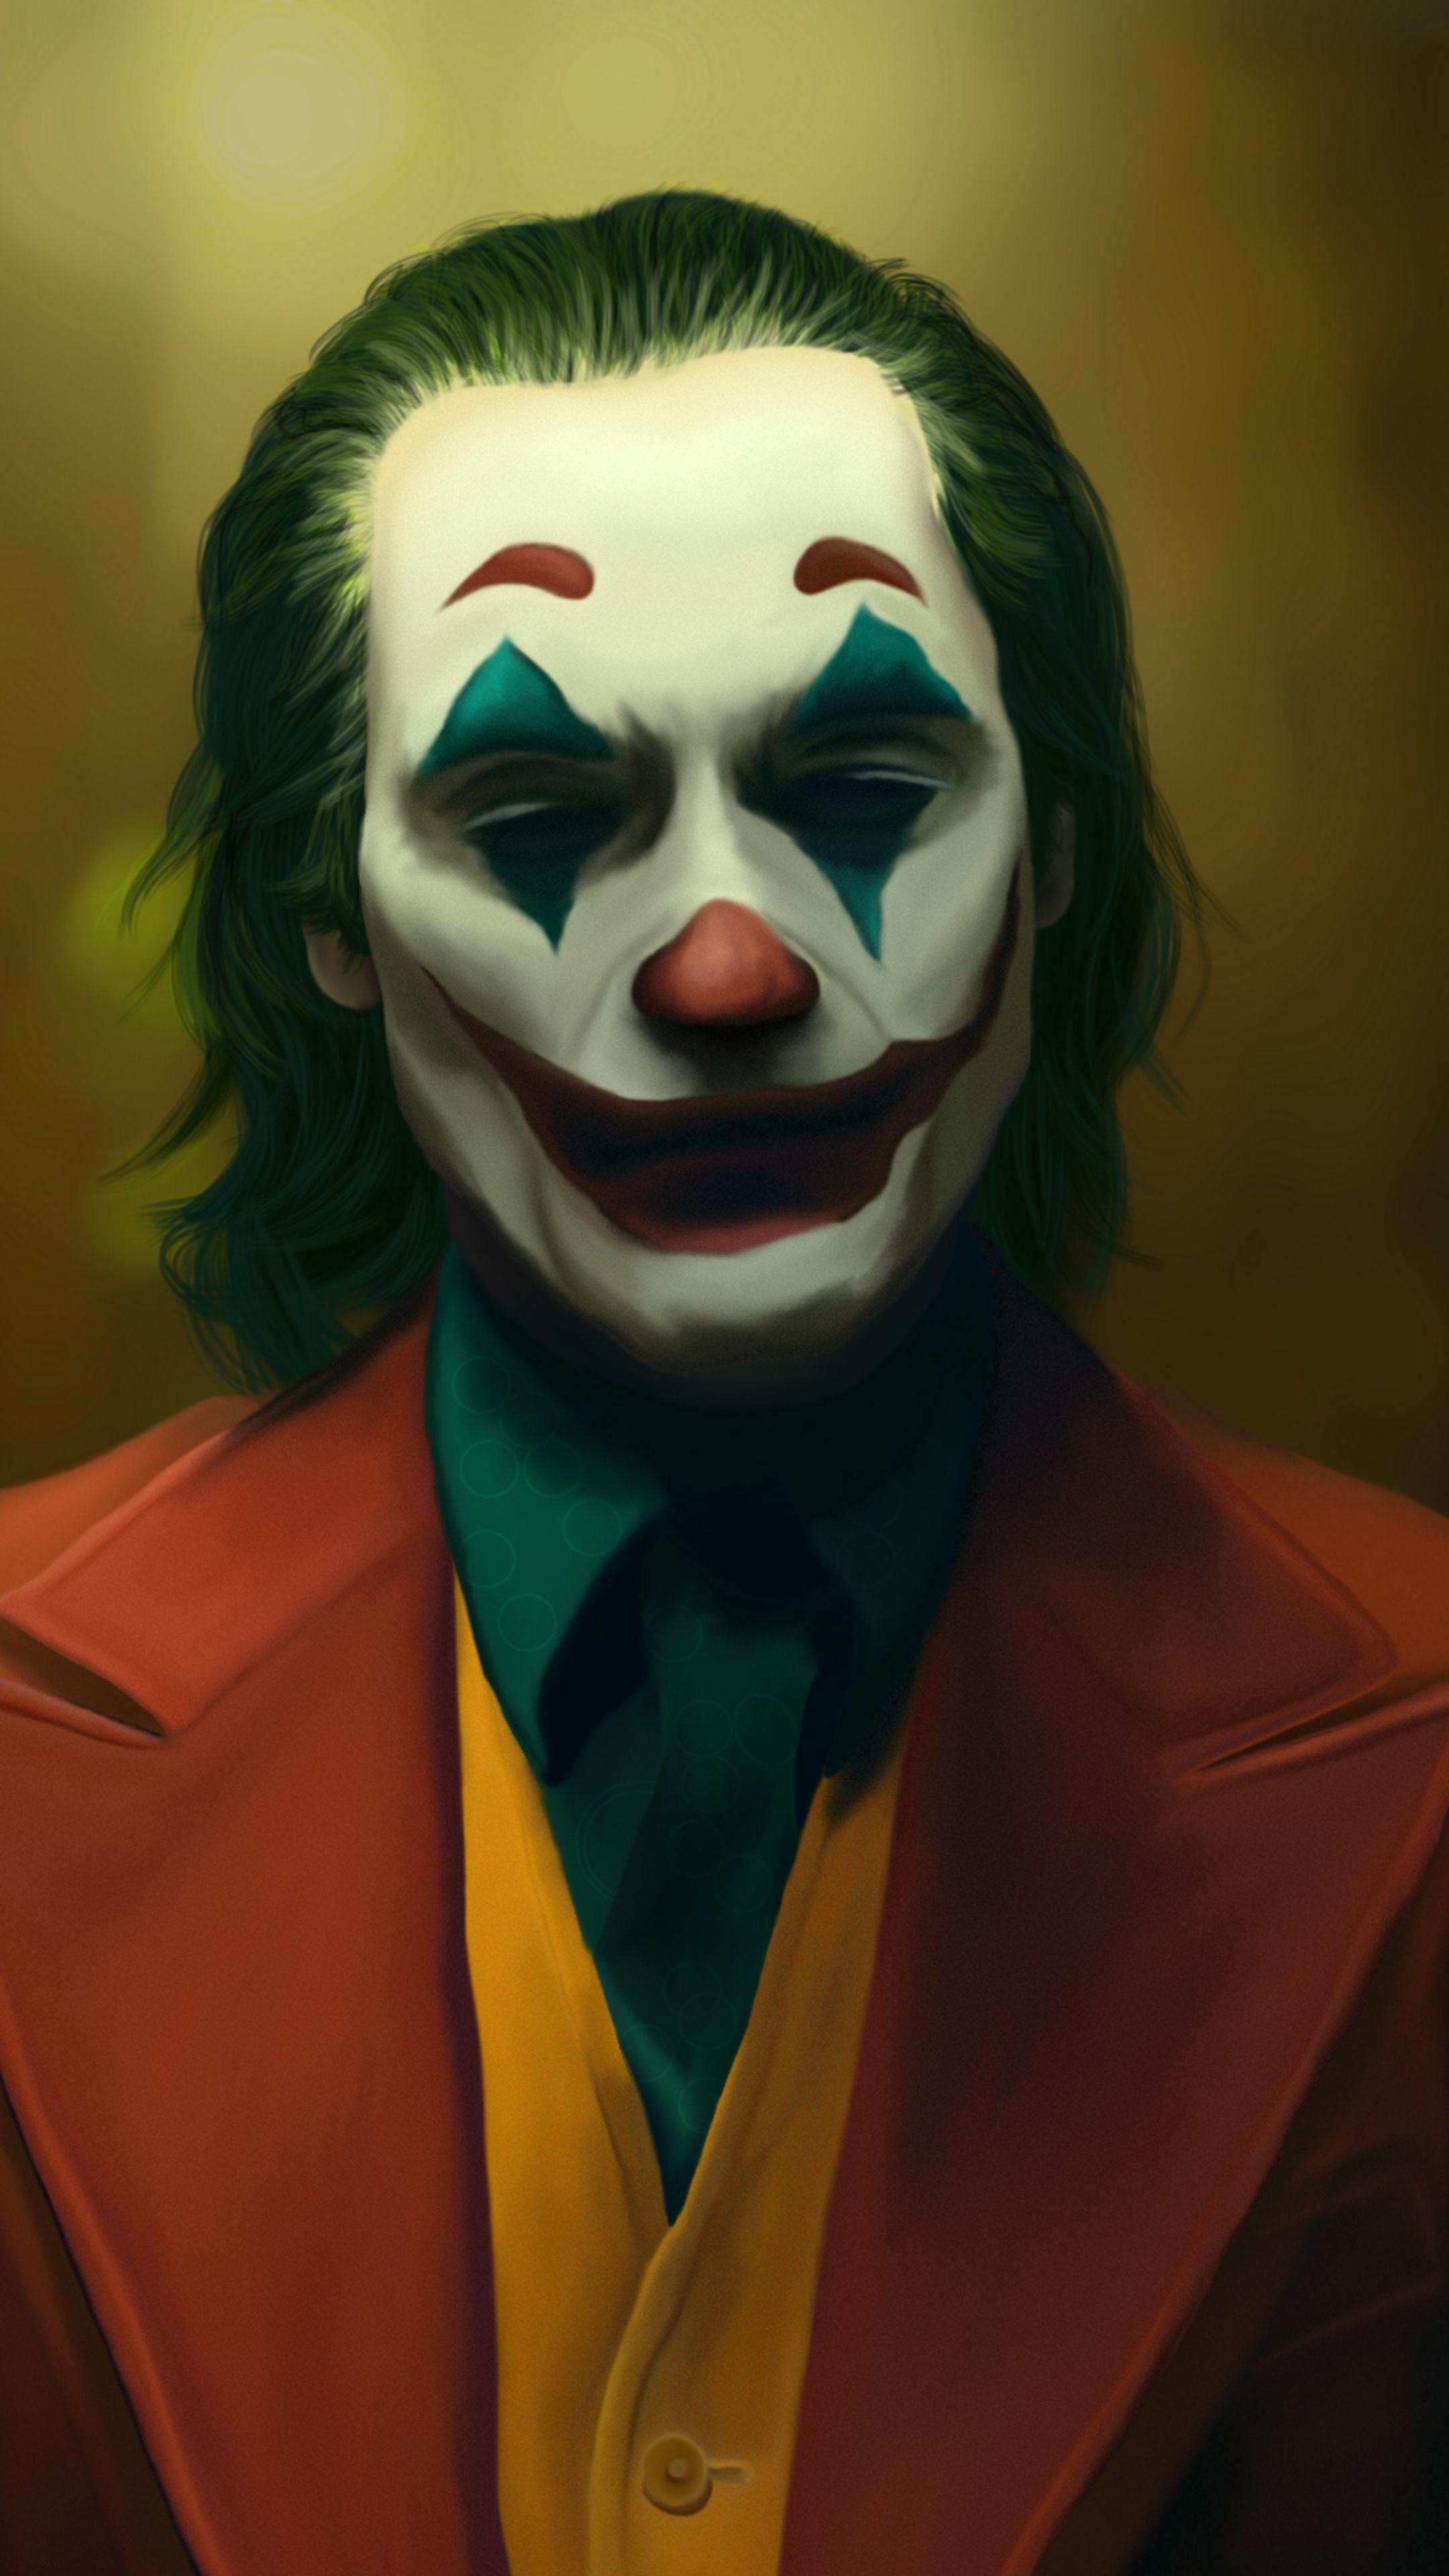 25 Best The Joker Halloween Costume Ideas 2019 Joker Iphone Wallpaper Joker Wallpapers Joker Hd Wallpaper